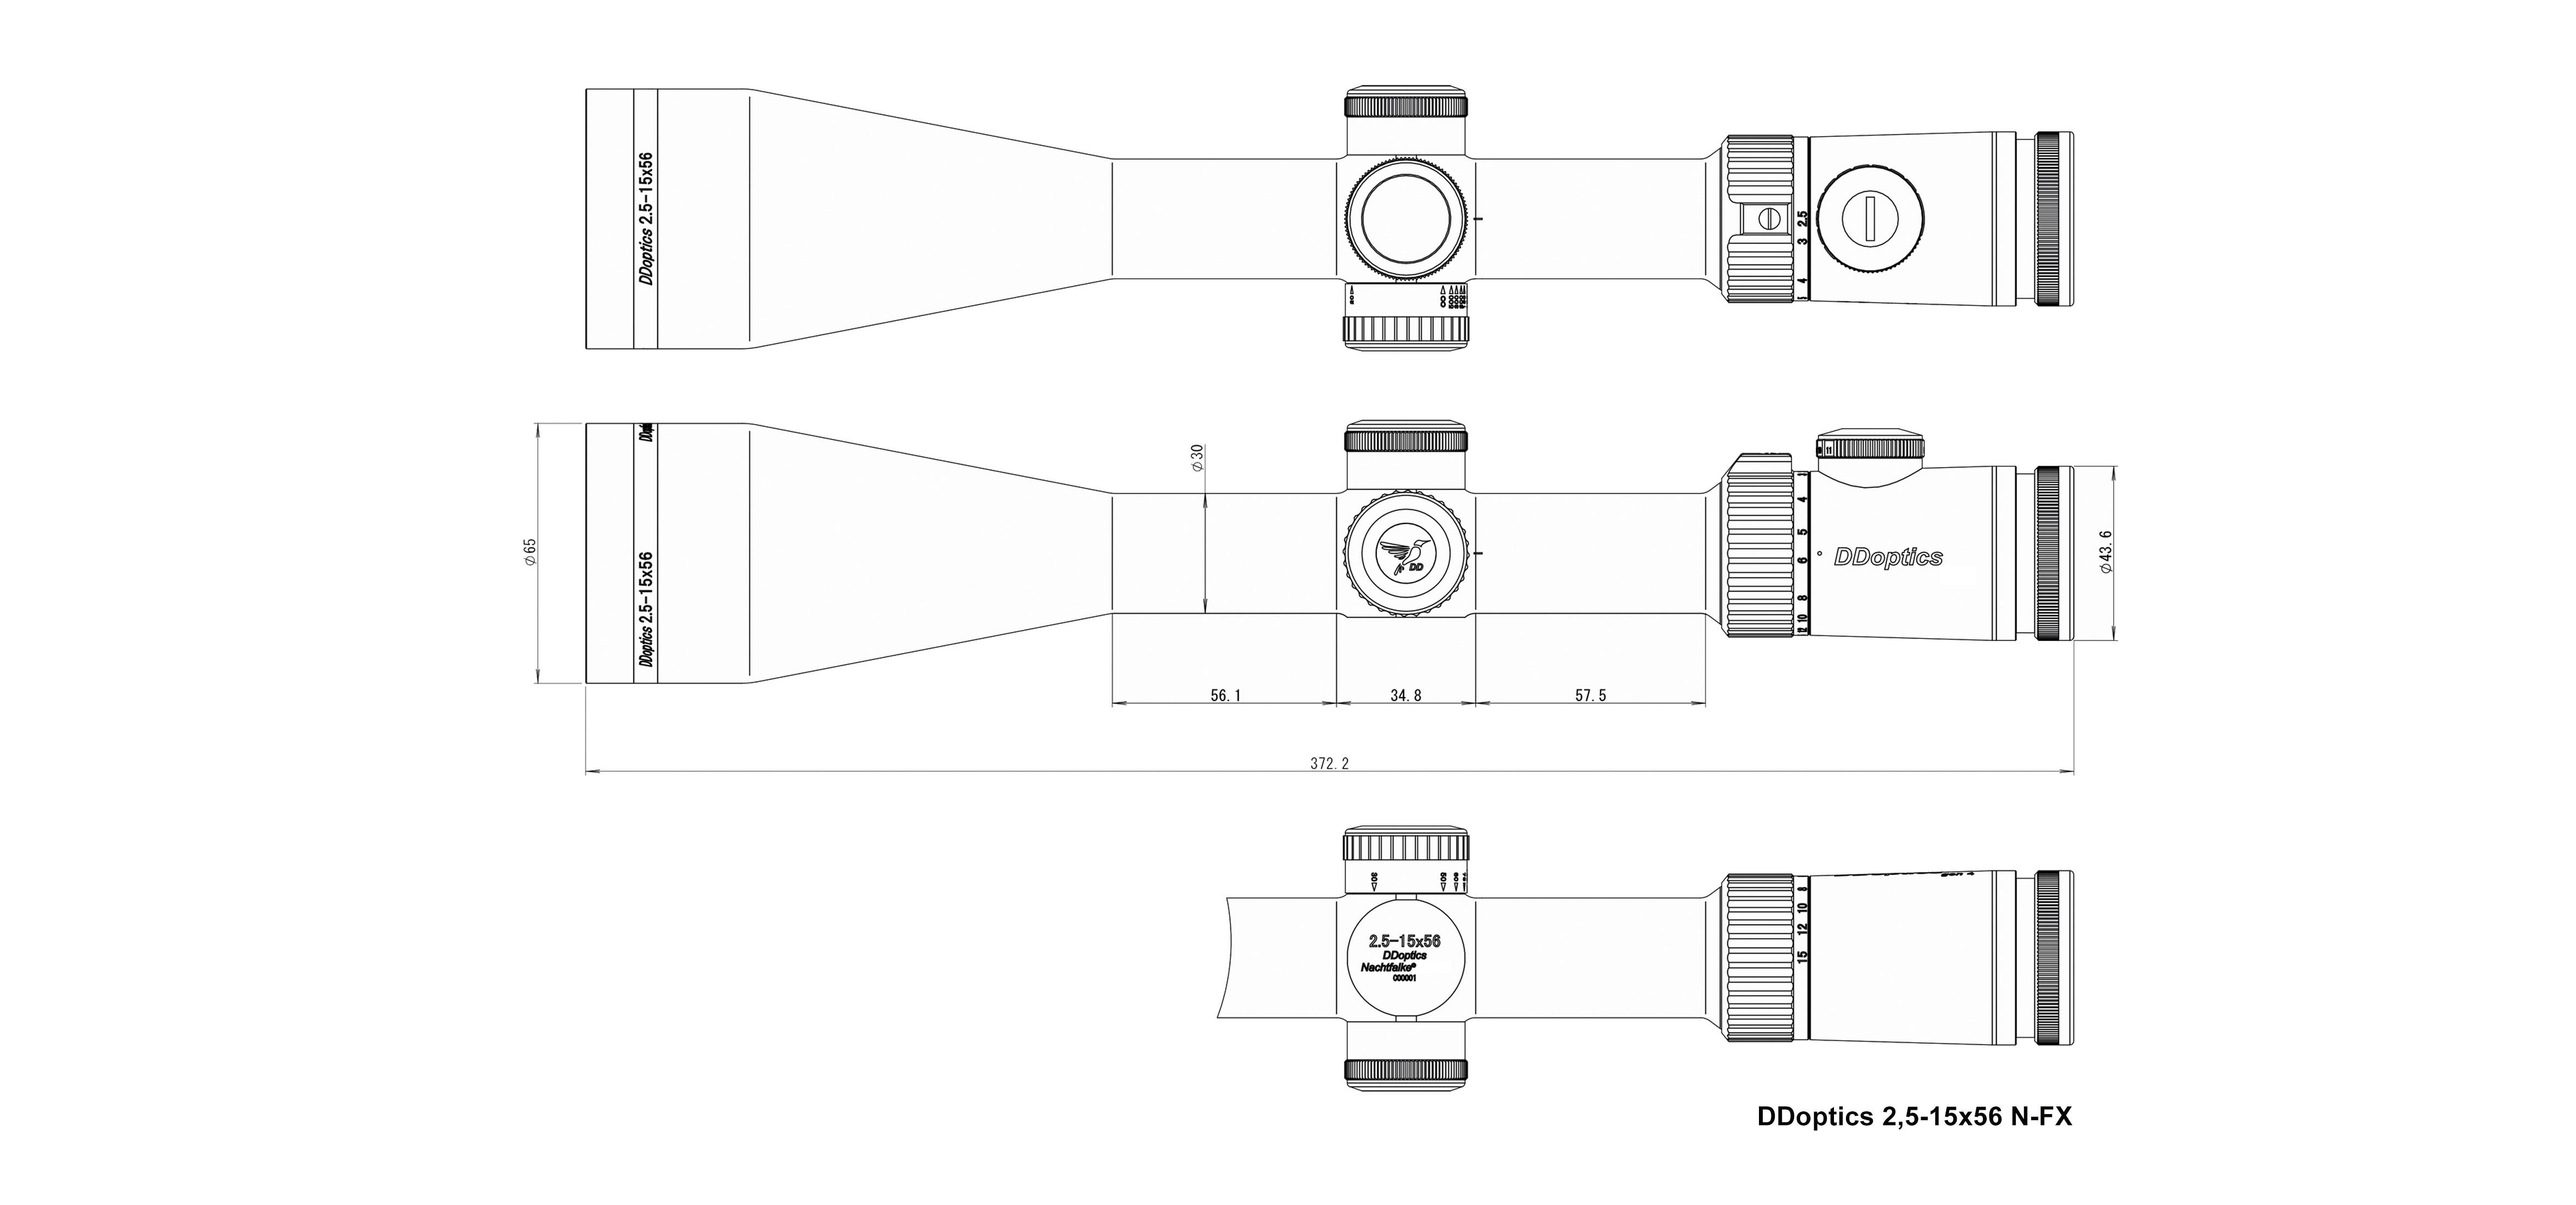 DDoptics Zielfernrohr 2,5-15x56